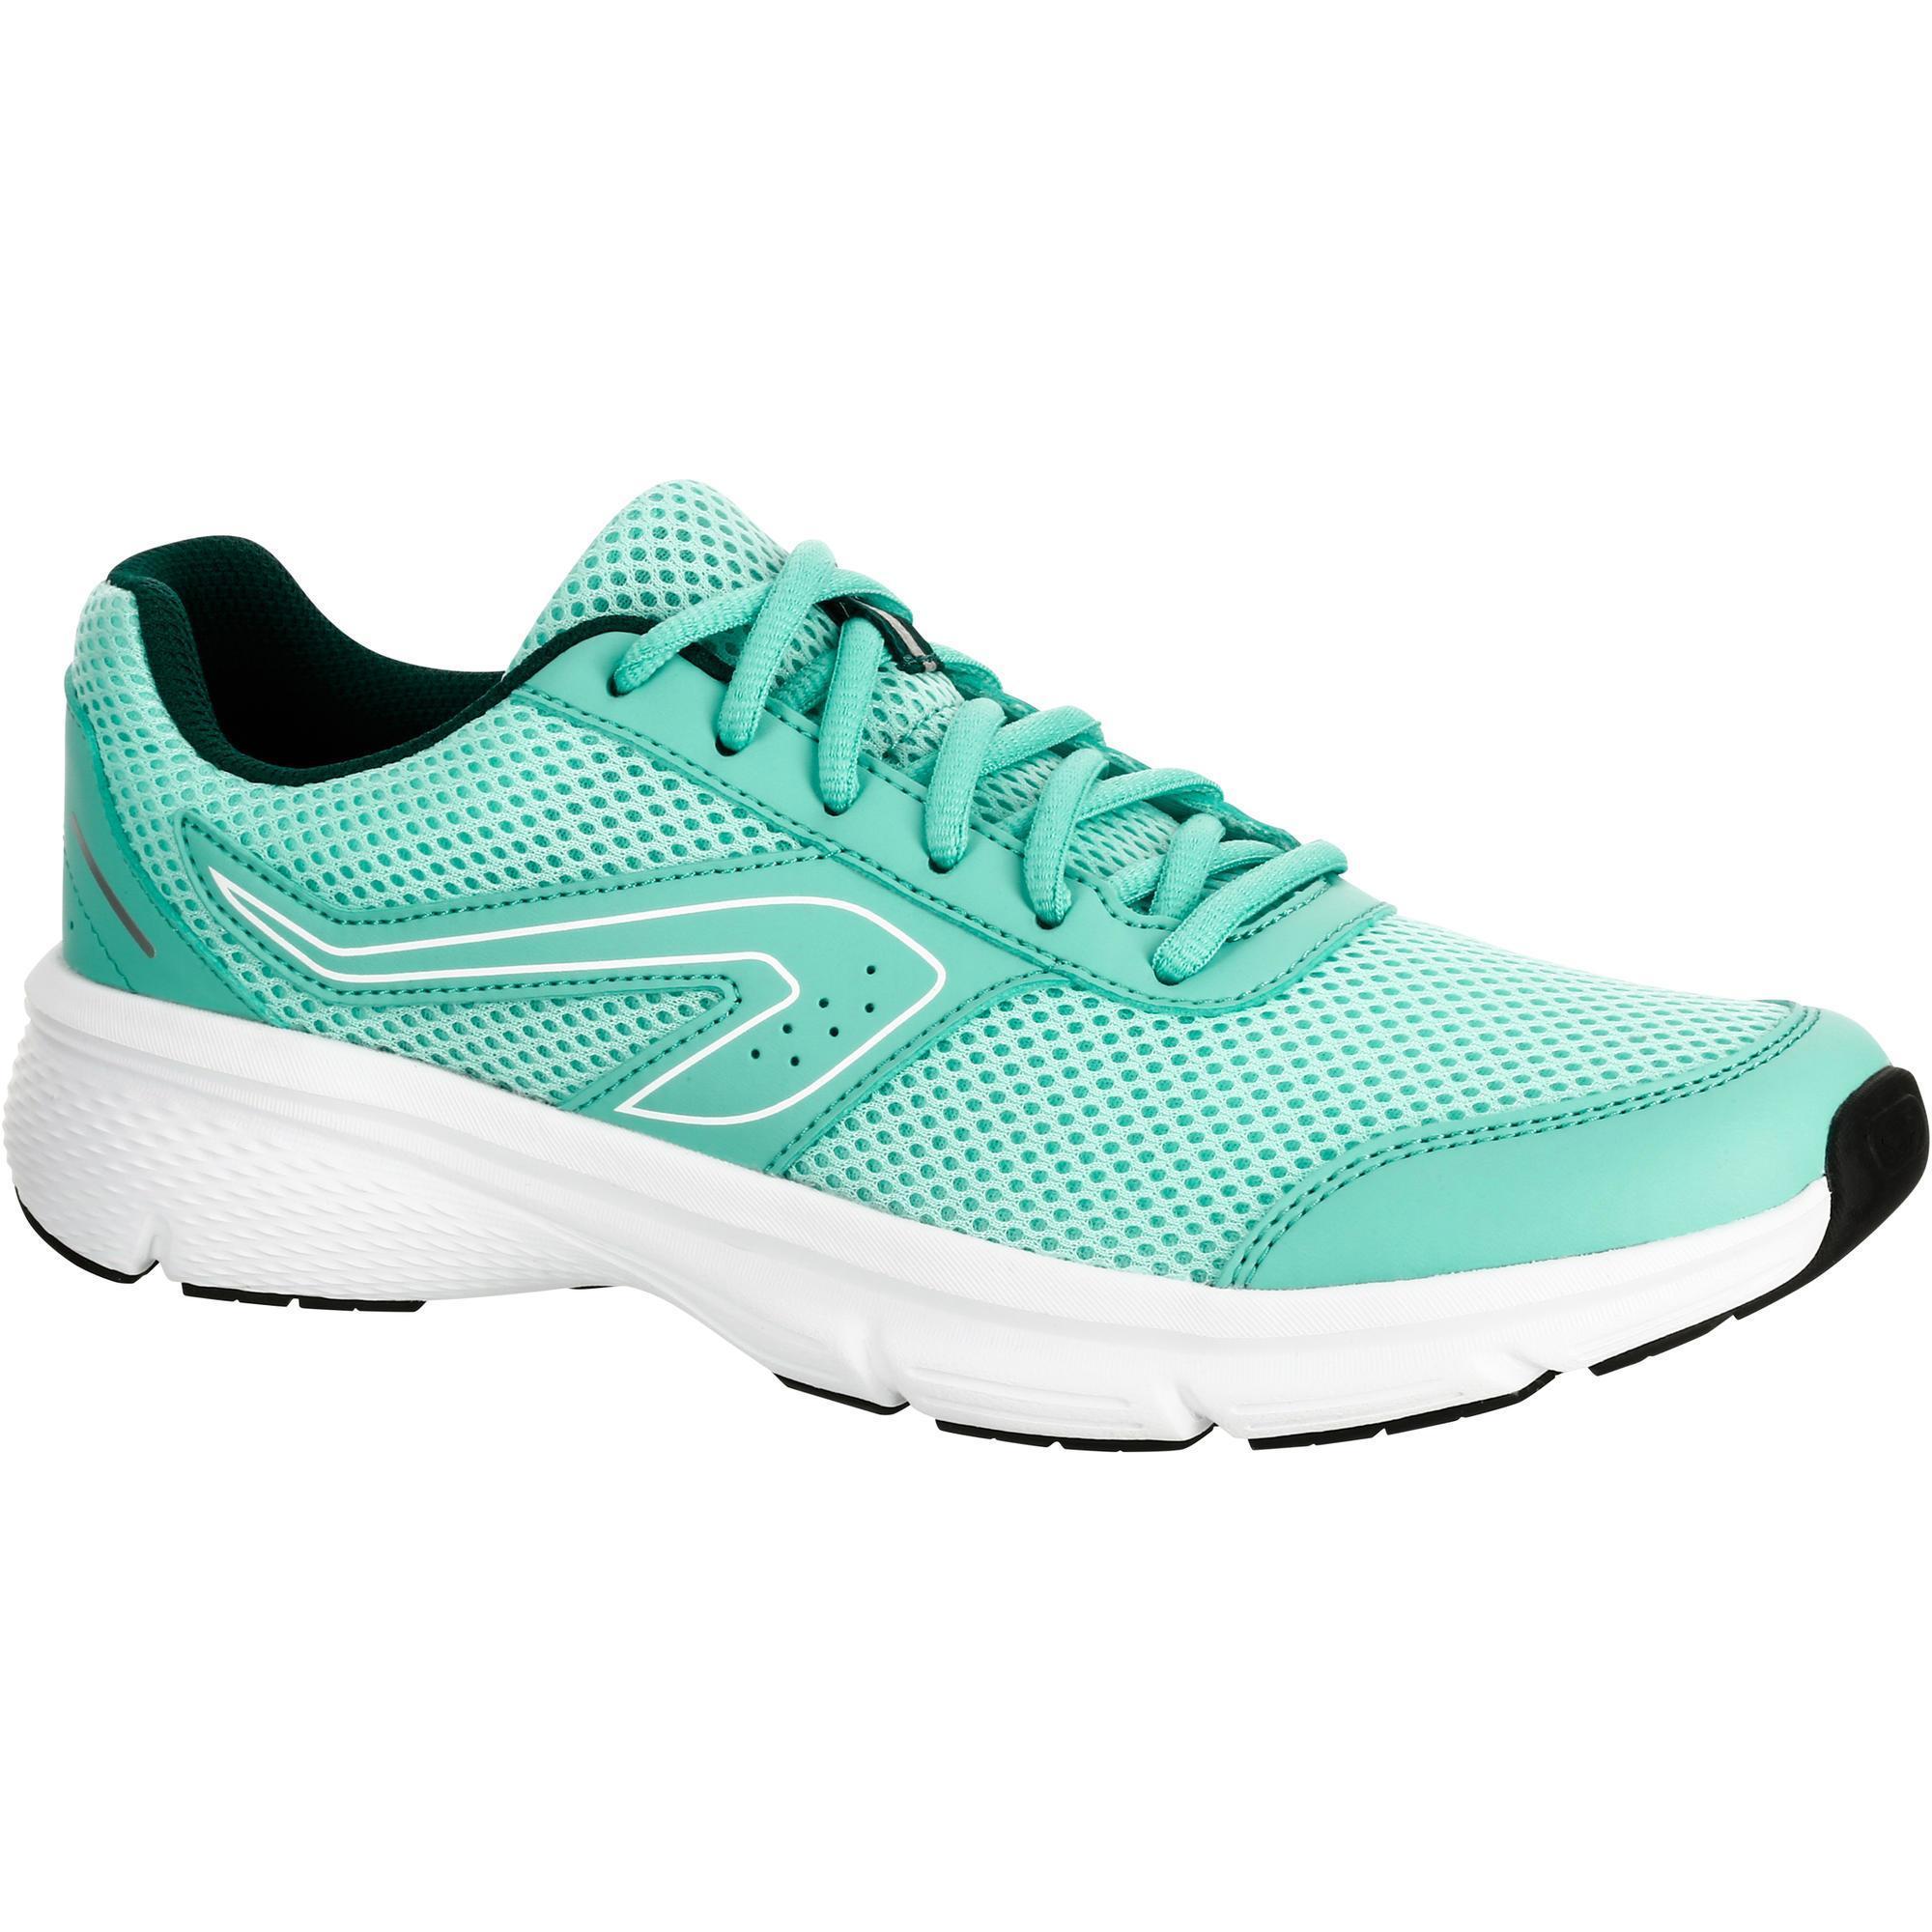 Kalenji Joggingschoenen voor dames Run Cushion lichtgroen kopen